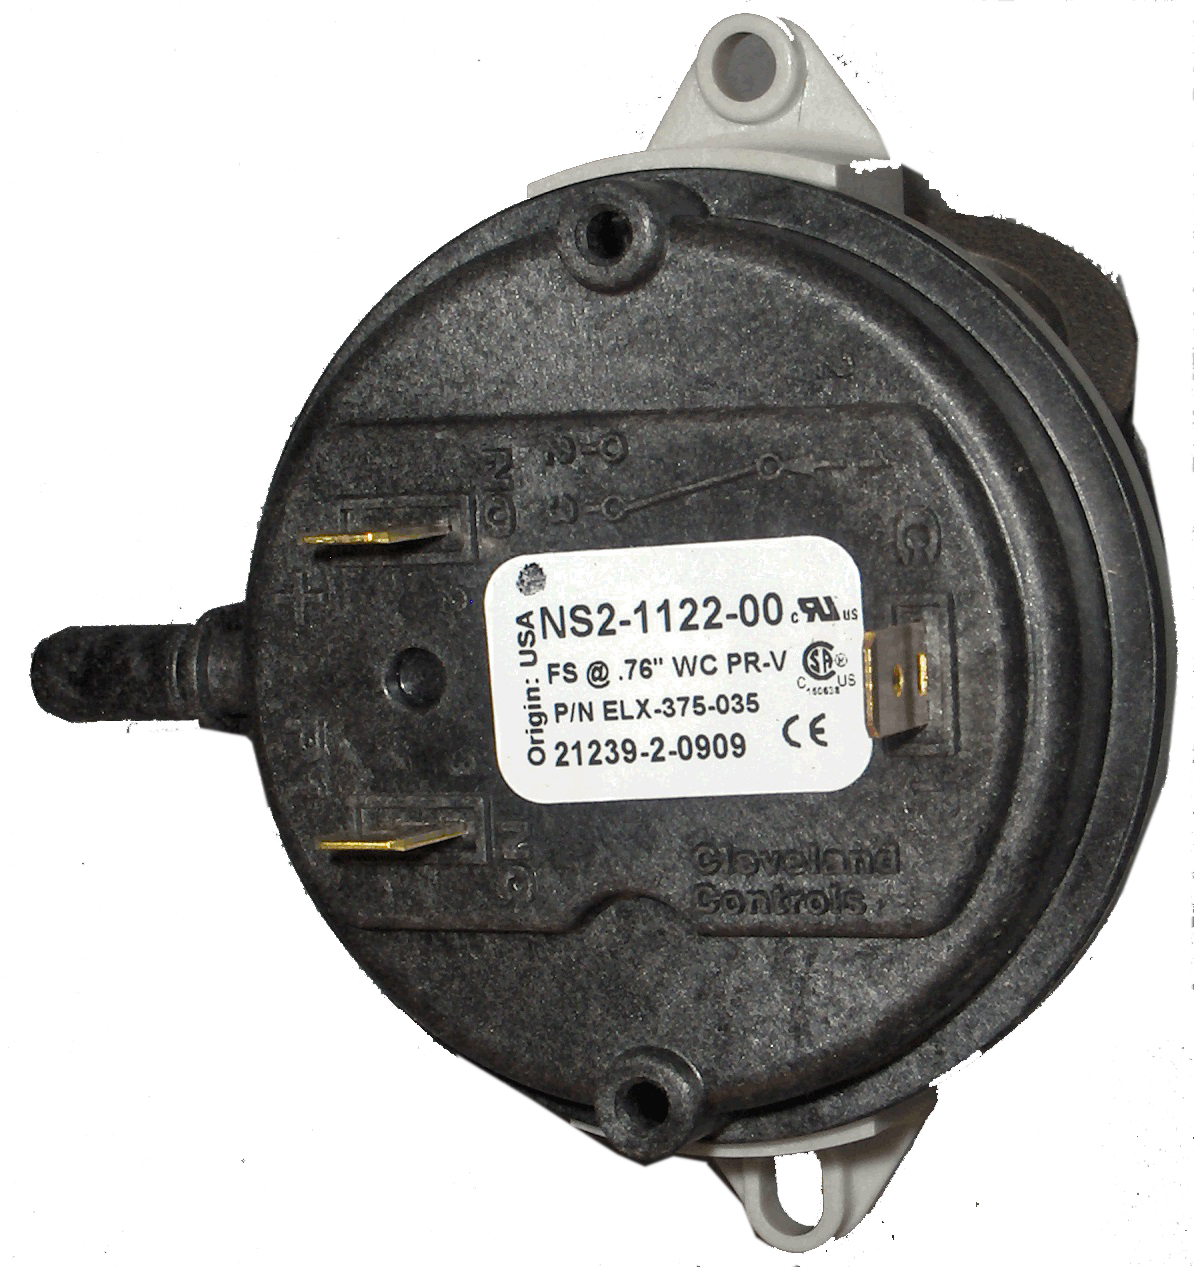 Back Pressure Switch, 376 WC